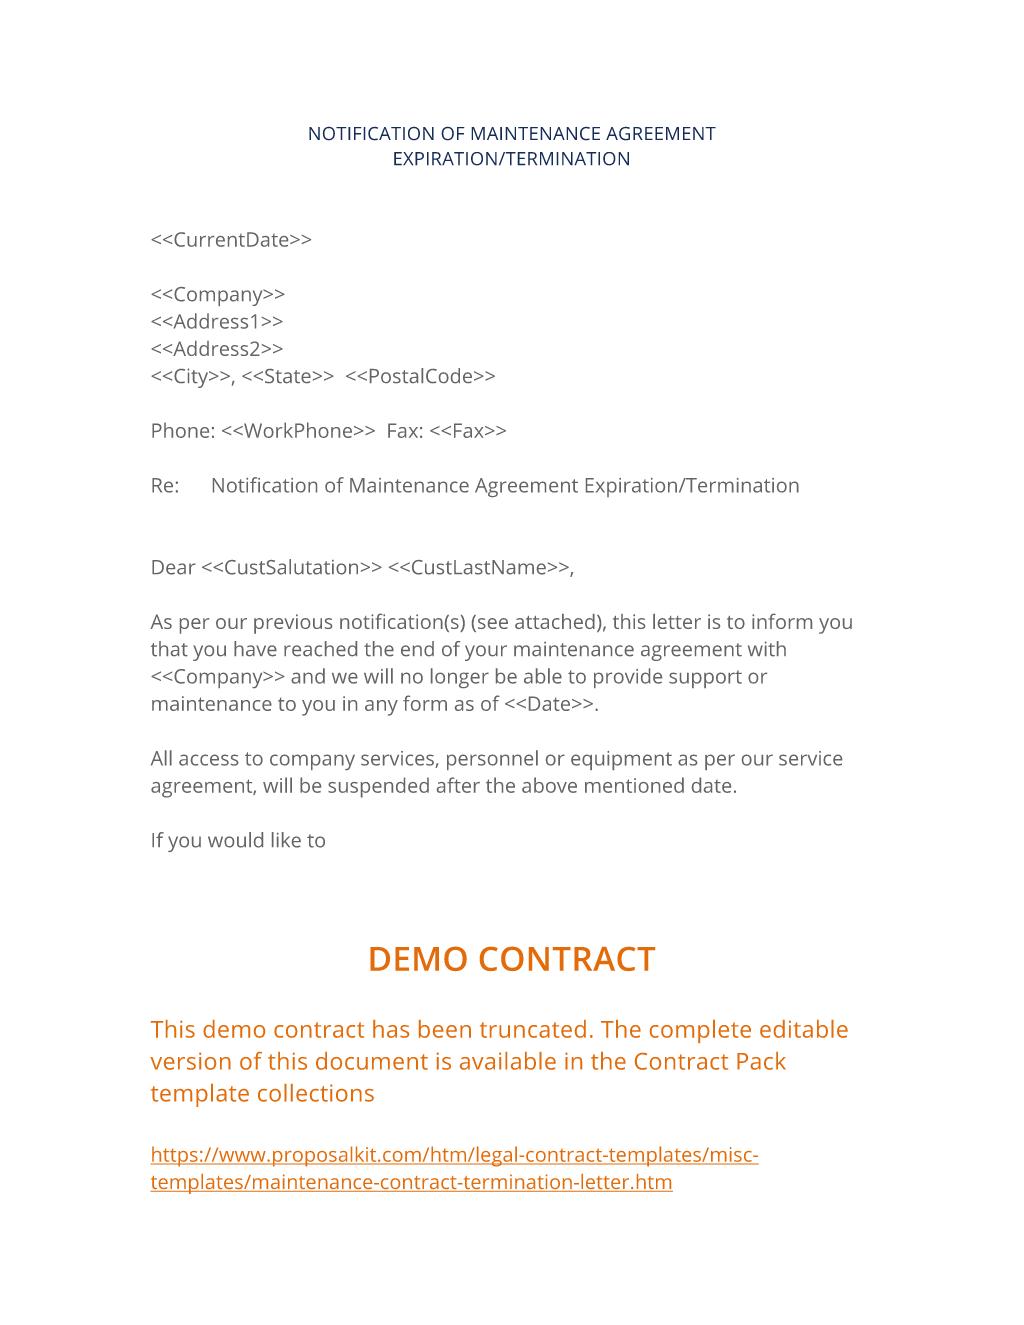 Maintenance Contract Termination Letter